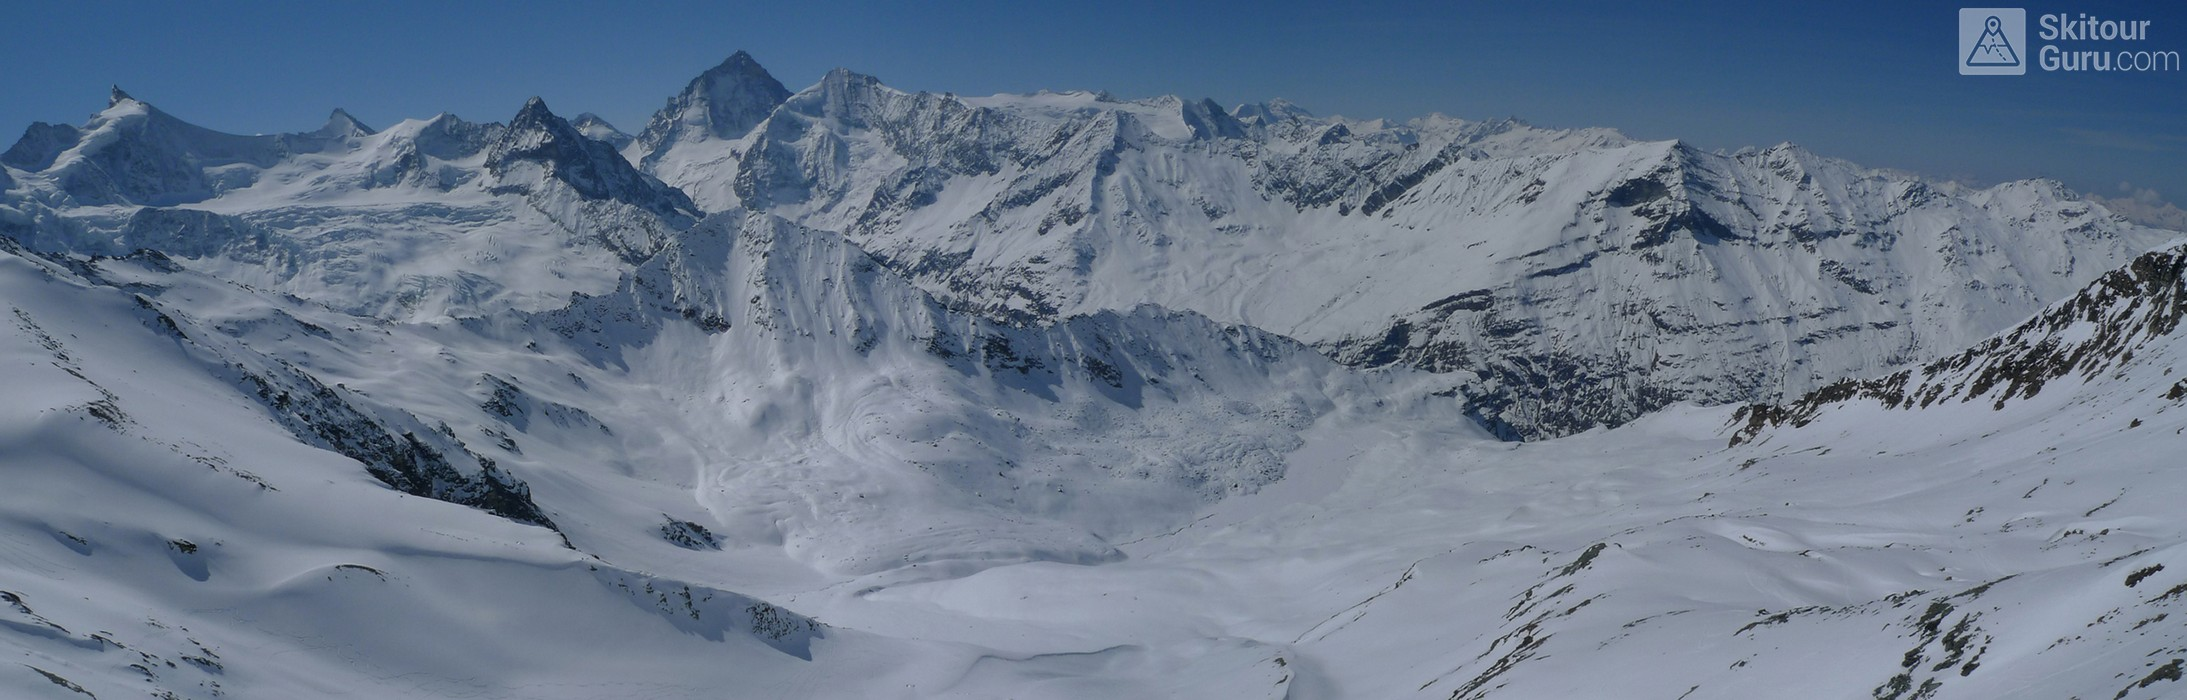 Cabane Tracuit Walliser Alpen / Alpes valaisannes Švýcarsko panorama 18